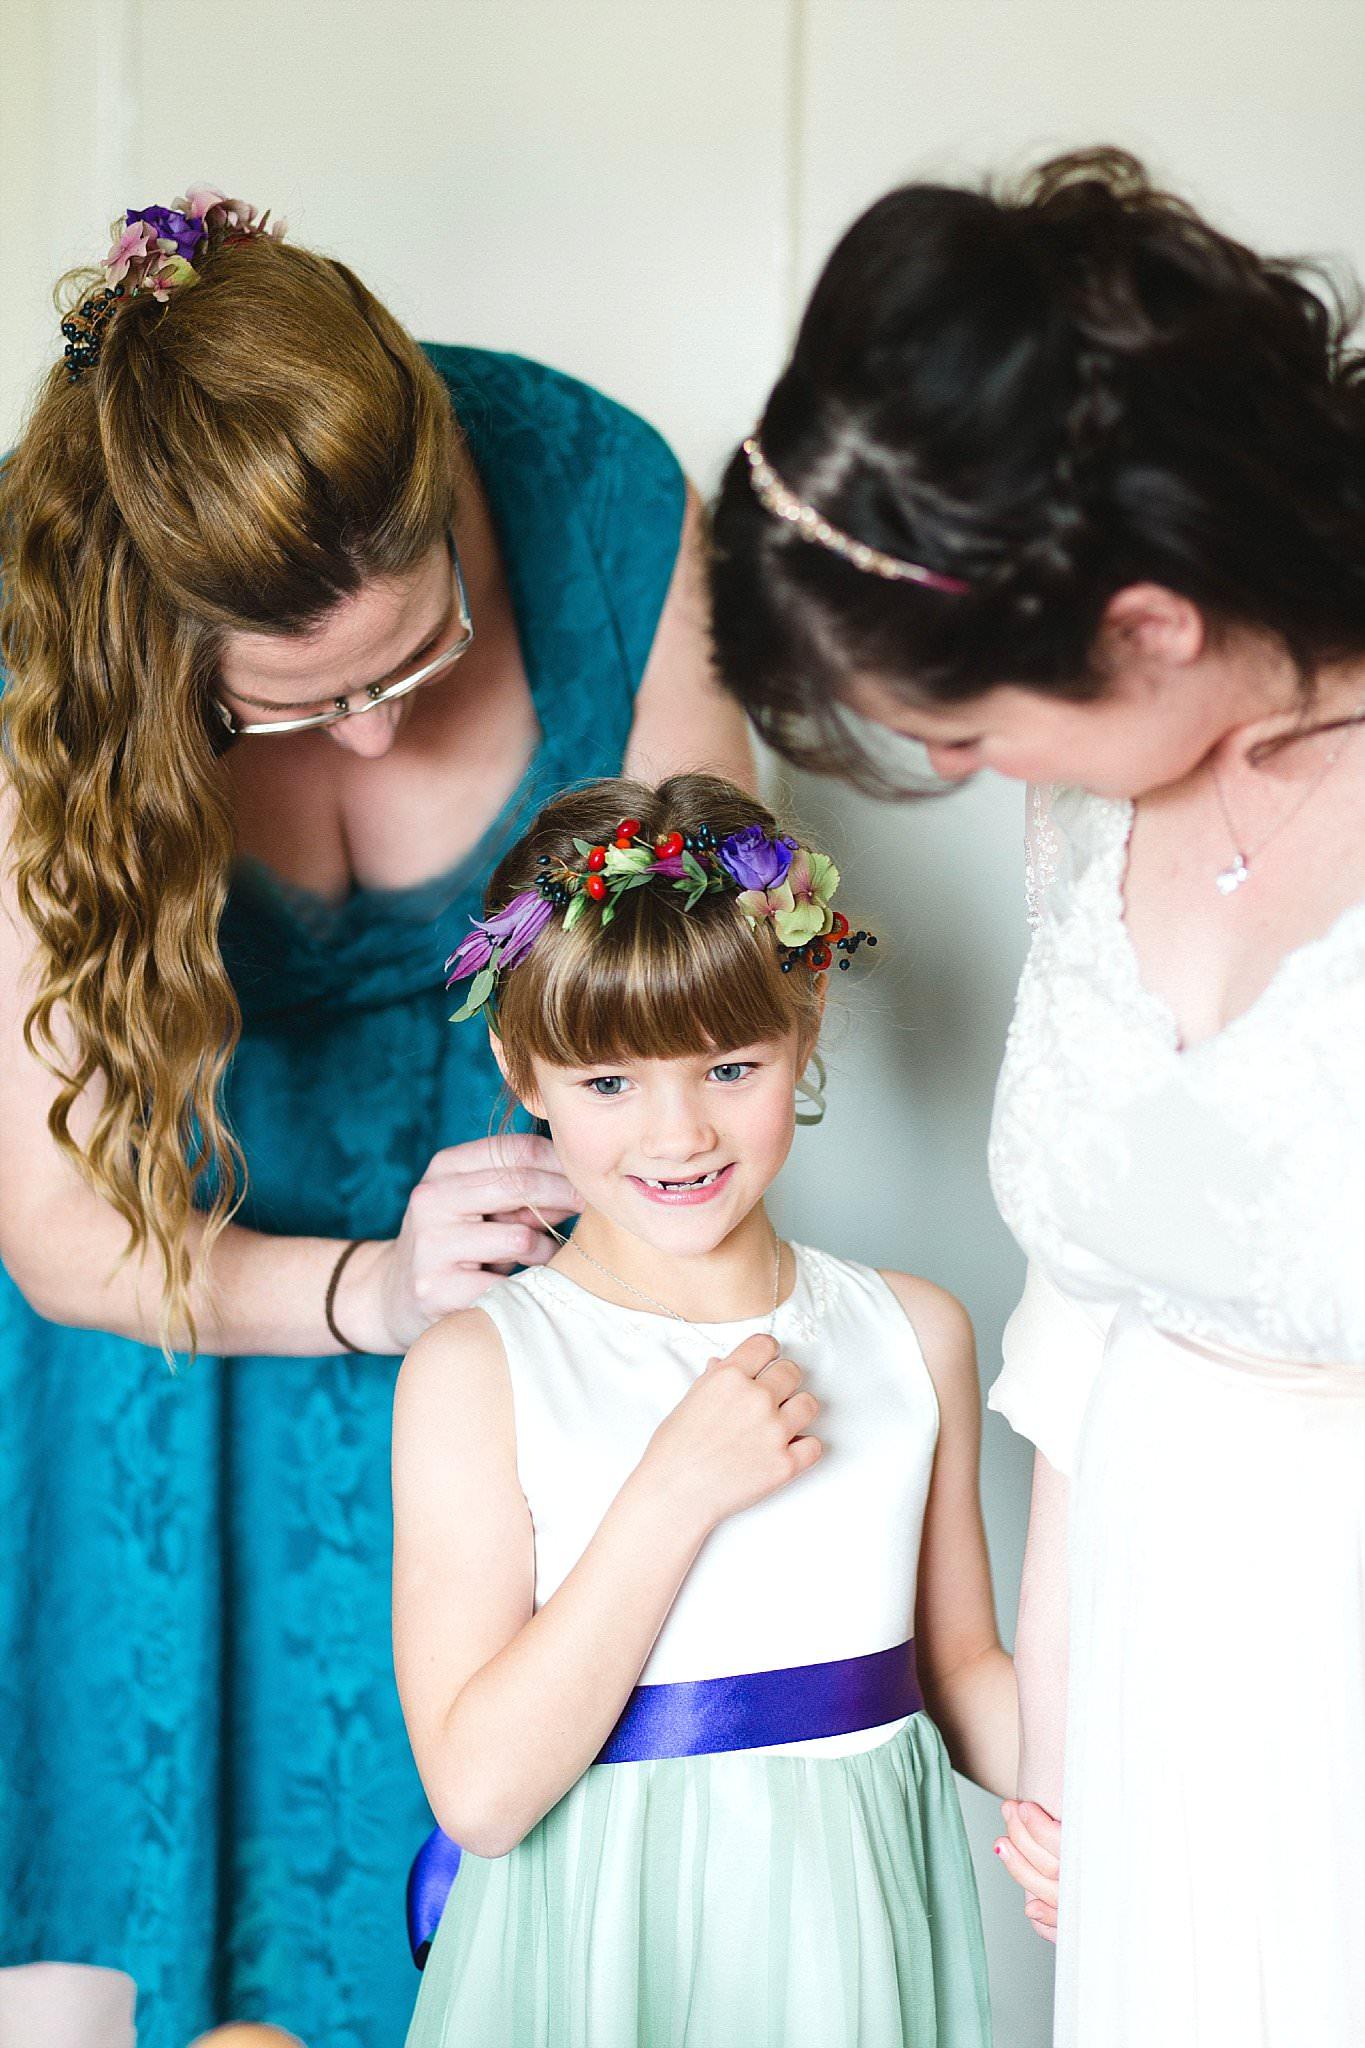 fine art wedding photographers scotland and canada,